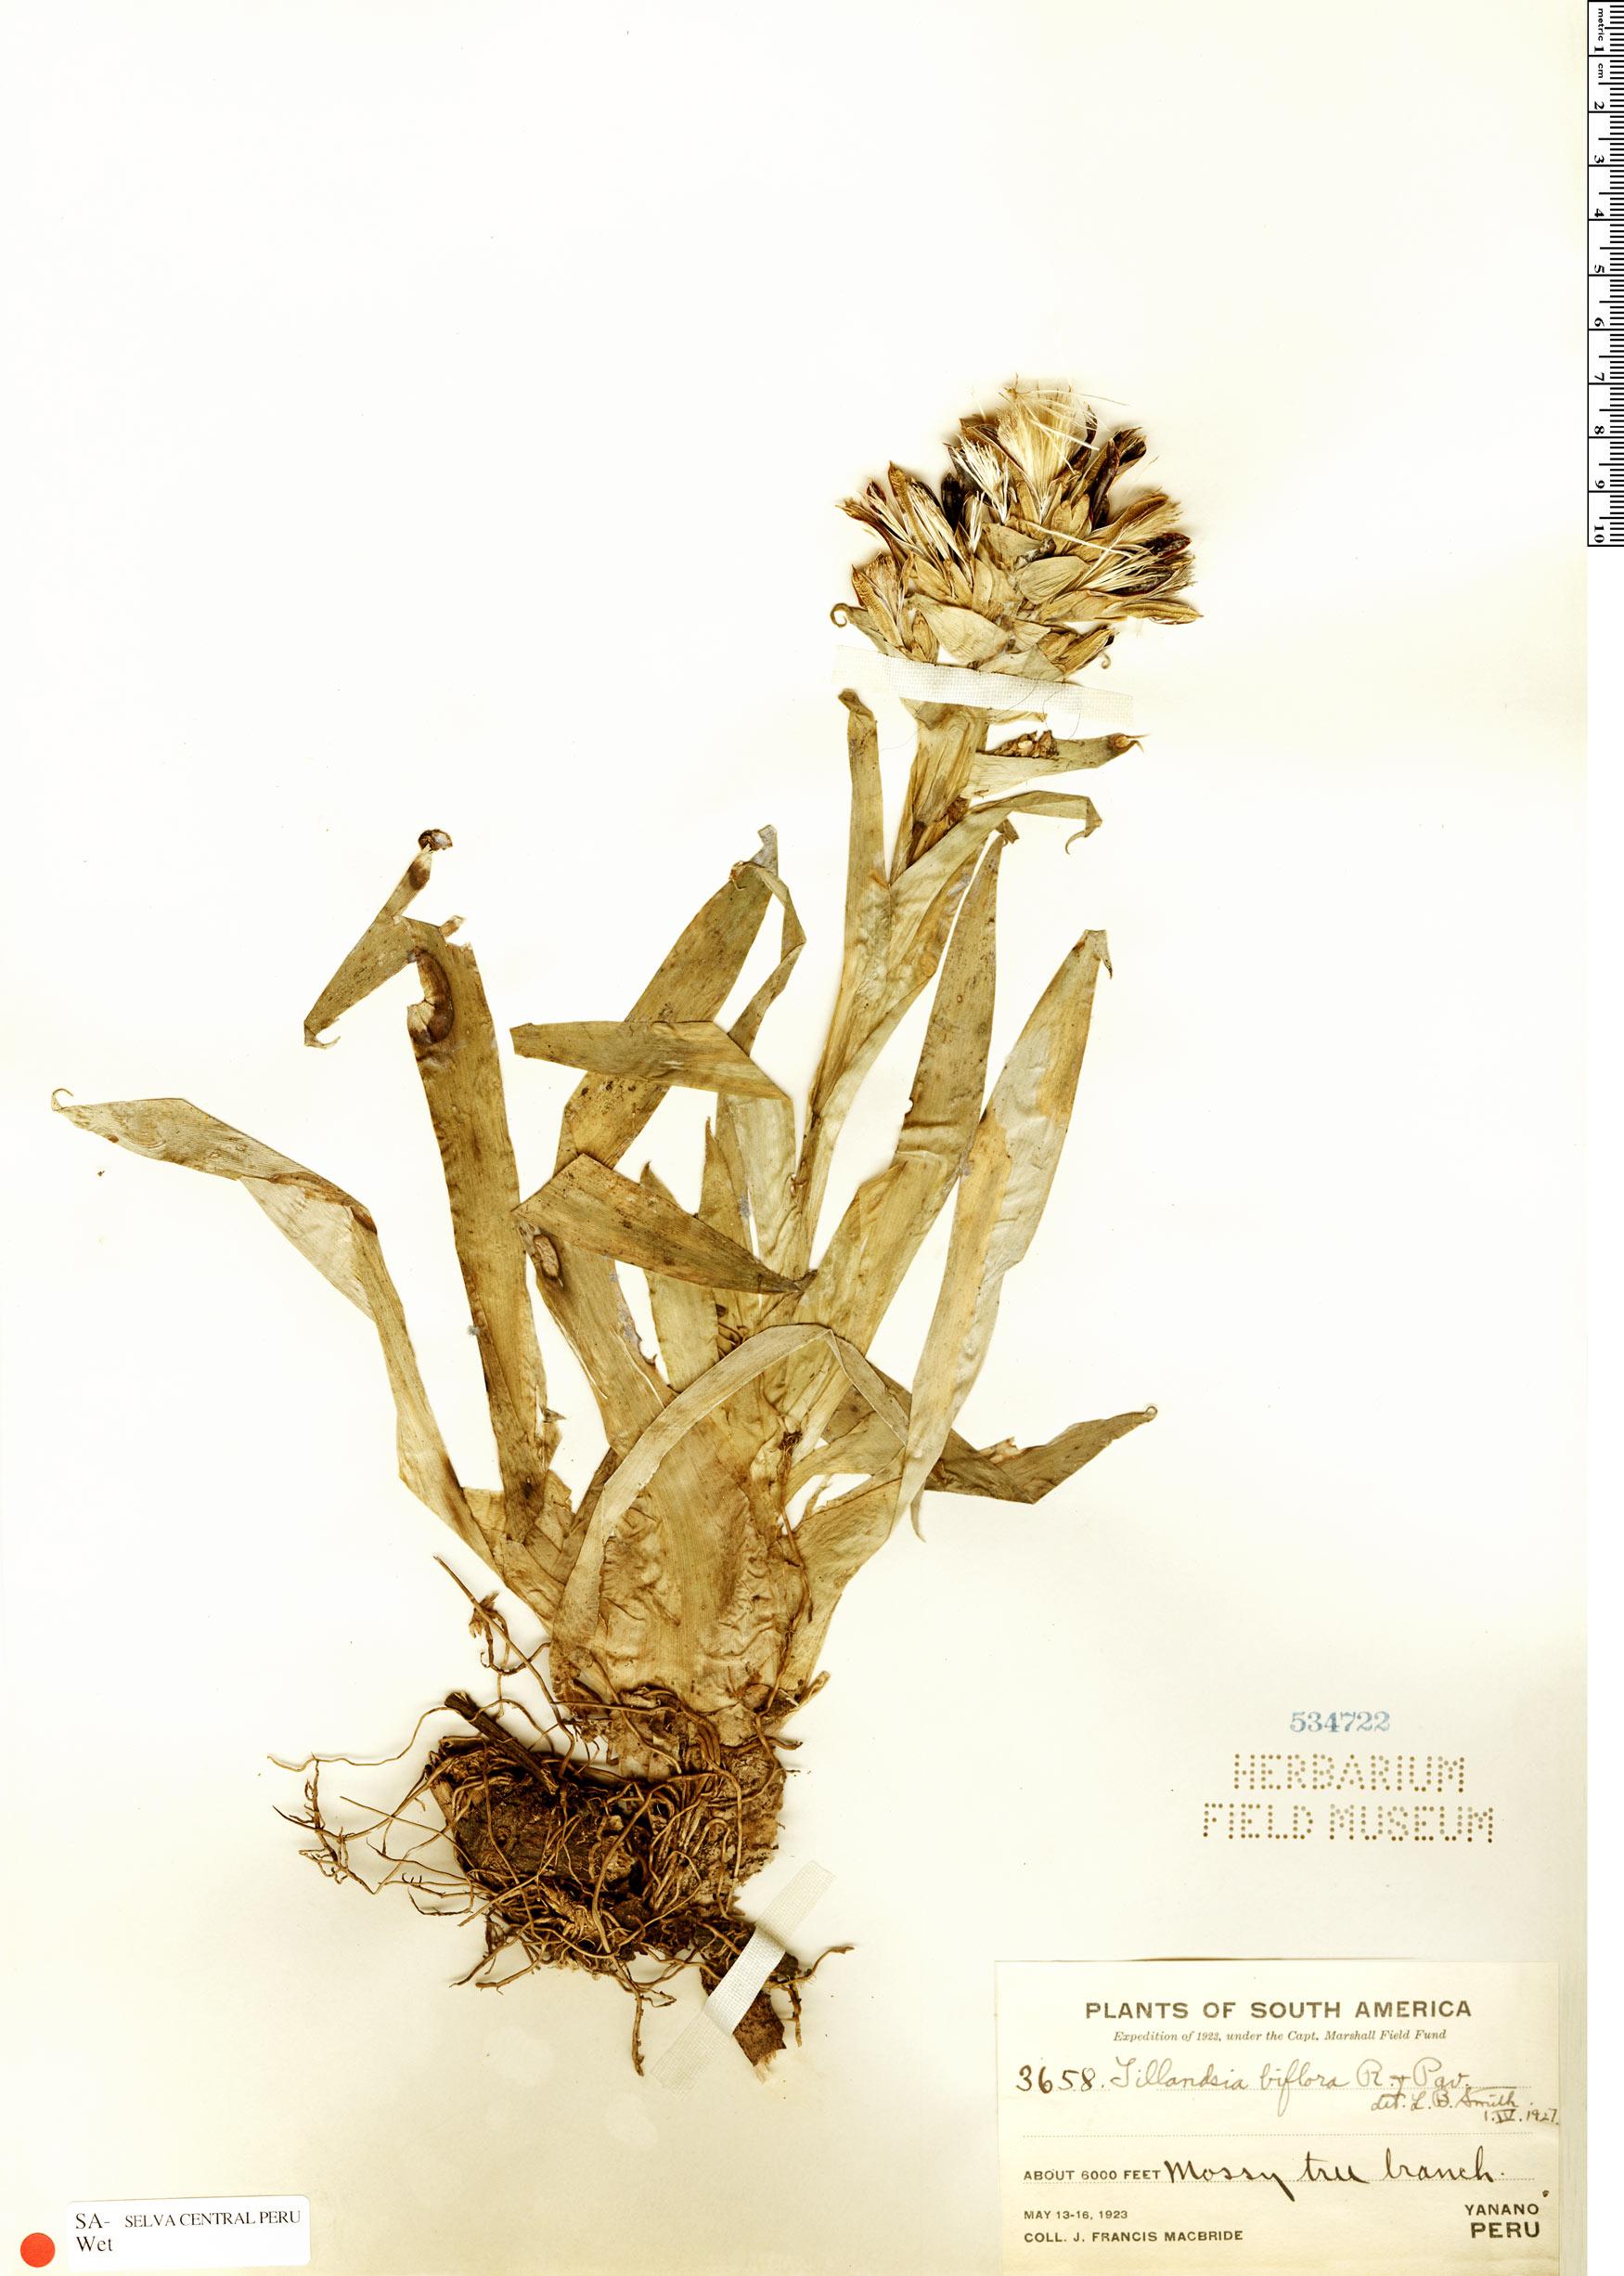 Specimen: Tillandsia biflora